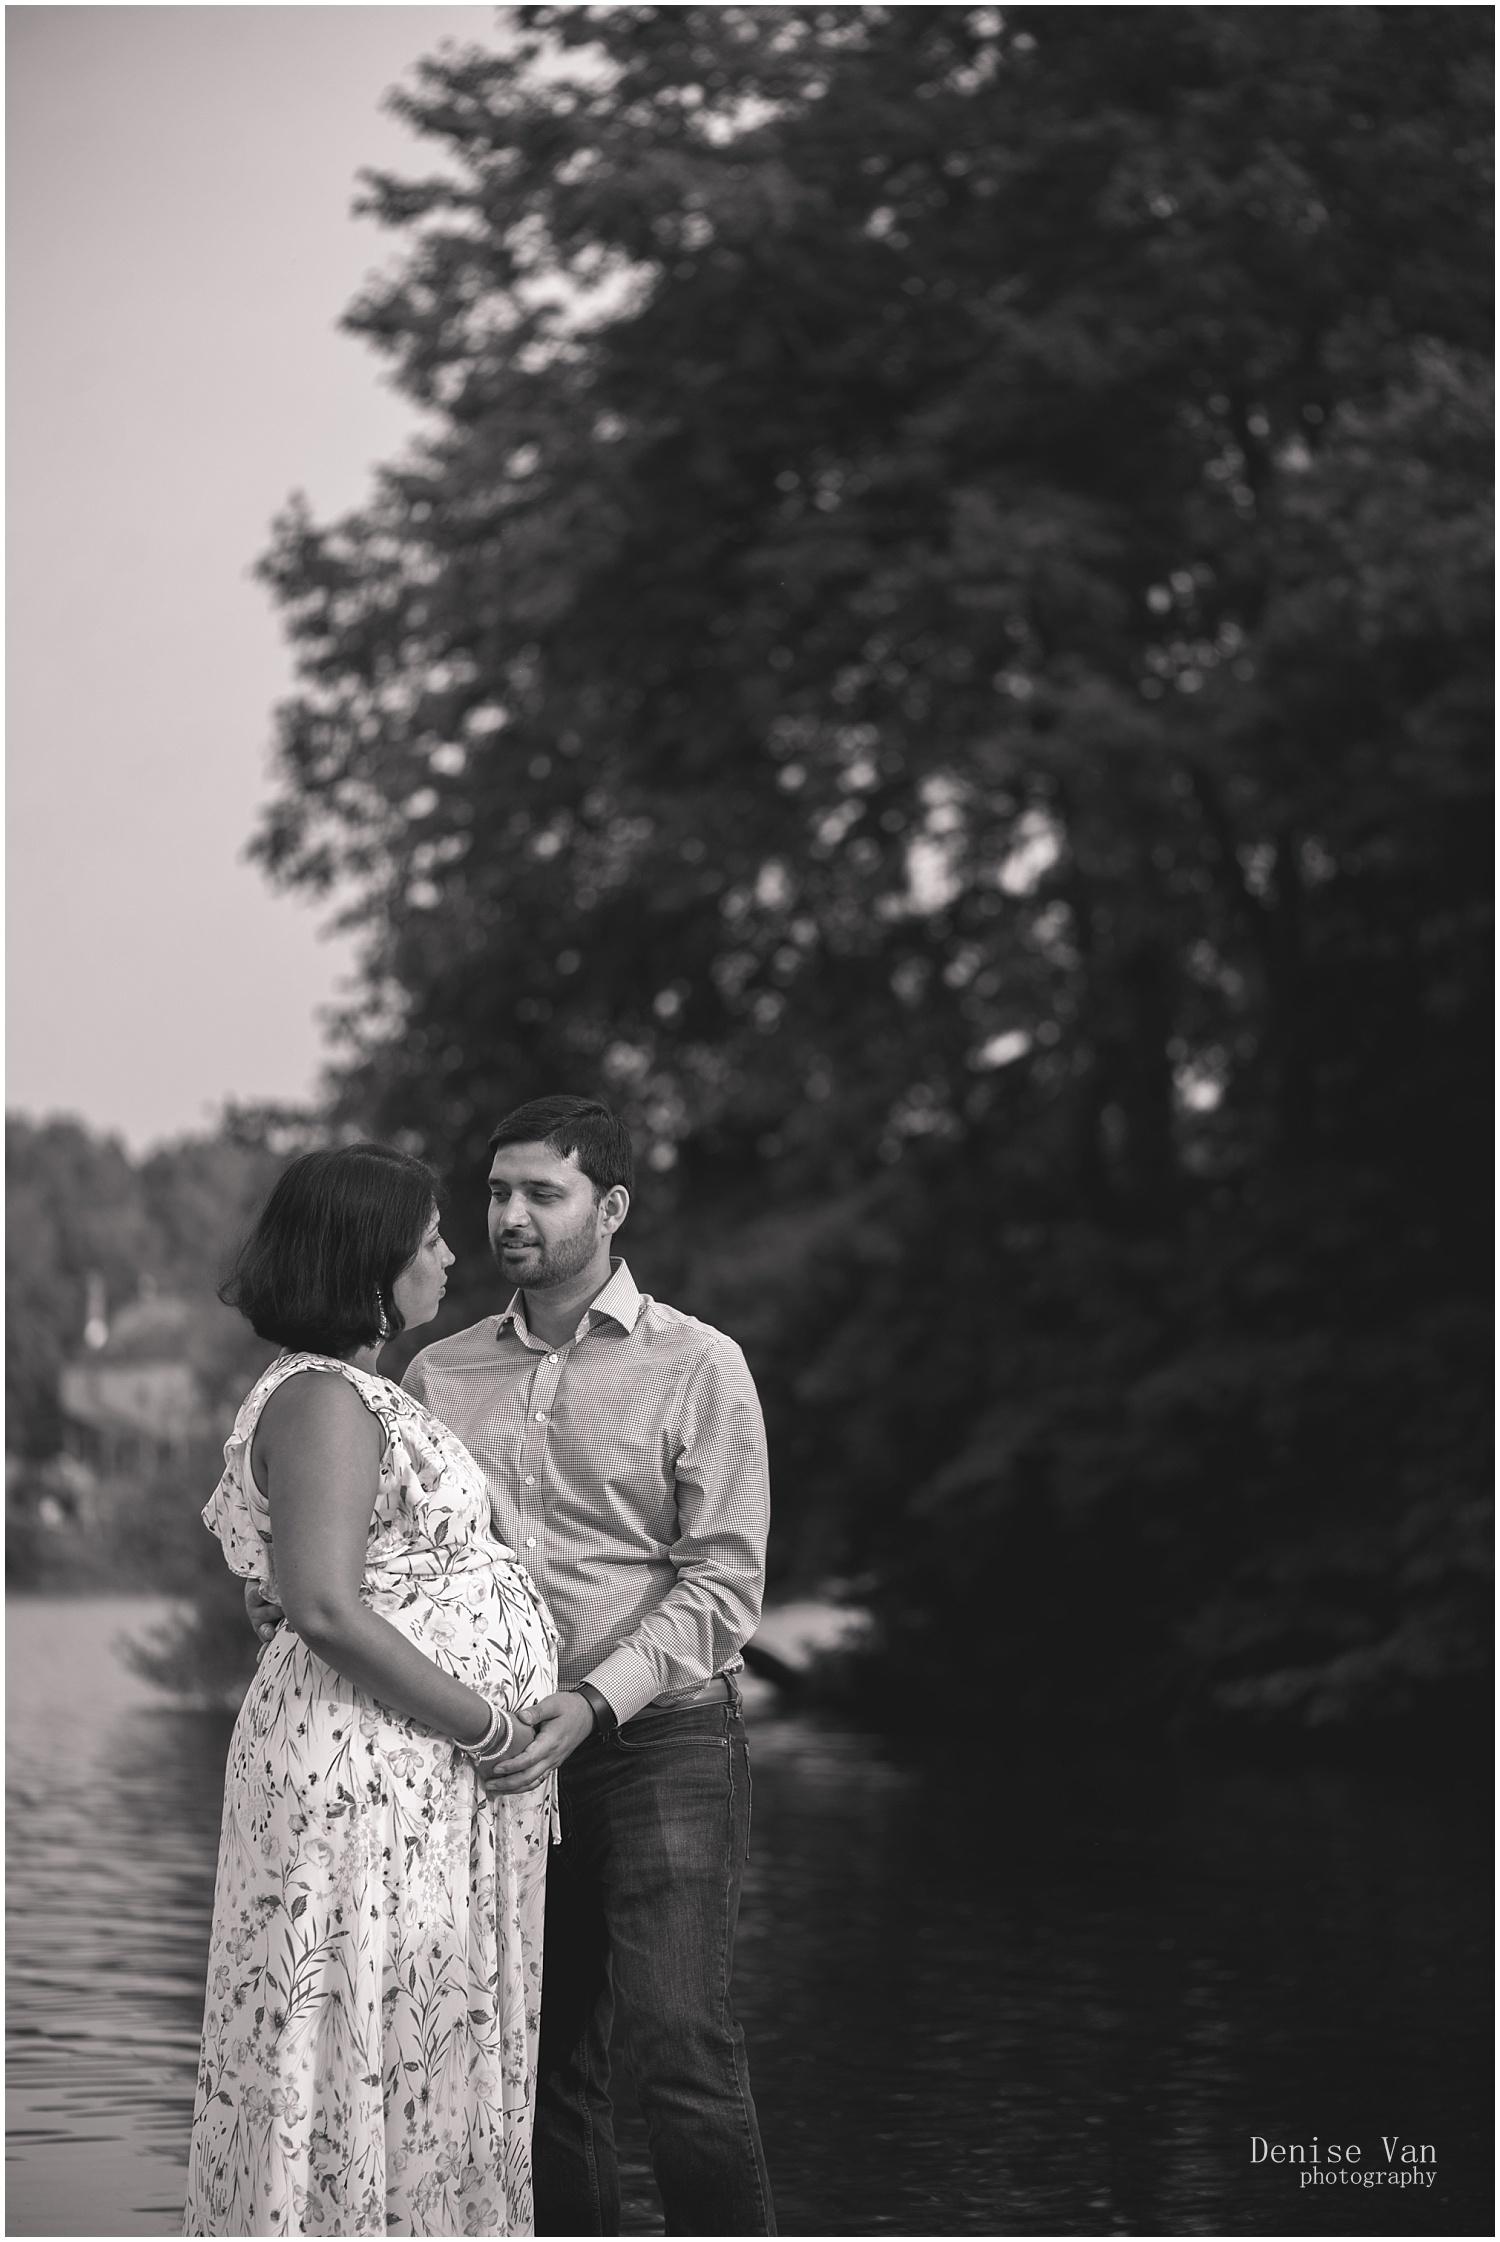 Denise-Van-Photography-New-Jersey-Maternity-Session_0022.jpg